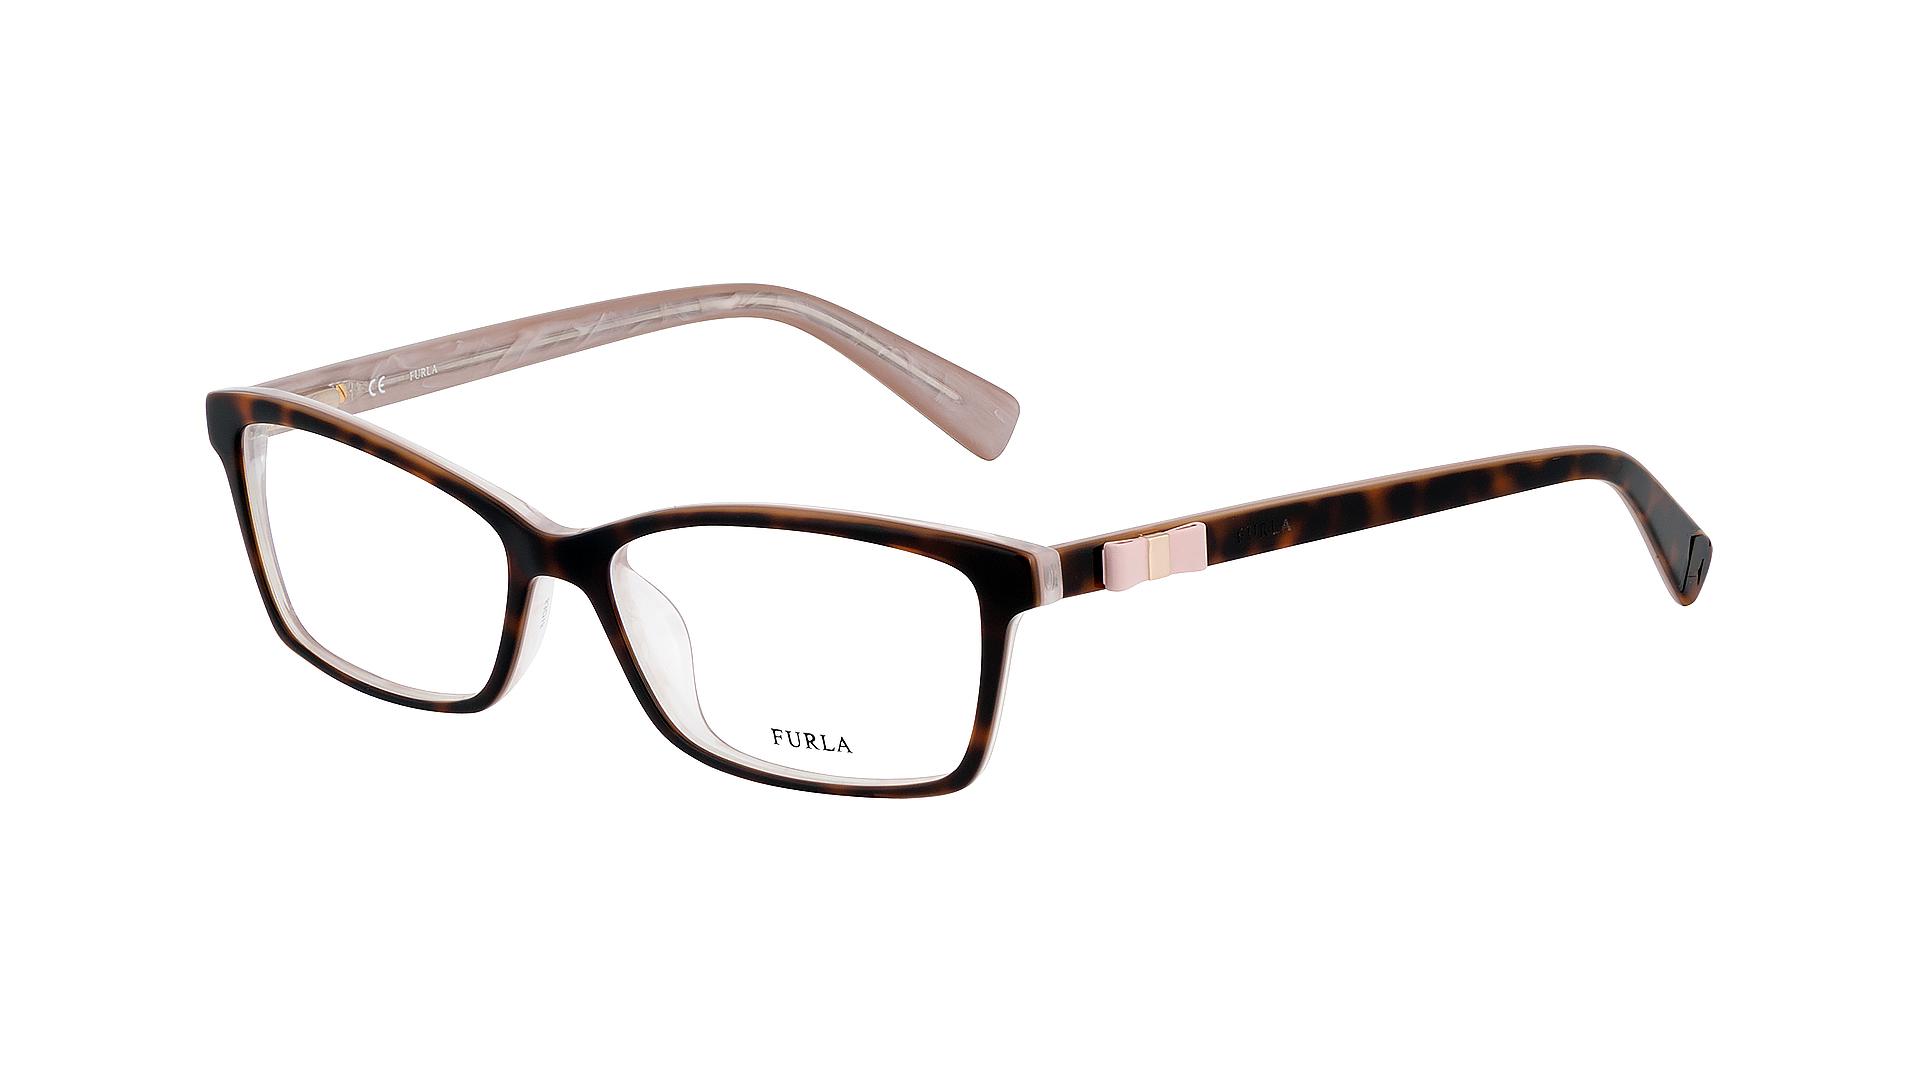 4638ccb899 Furla Eyeglasses Frames